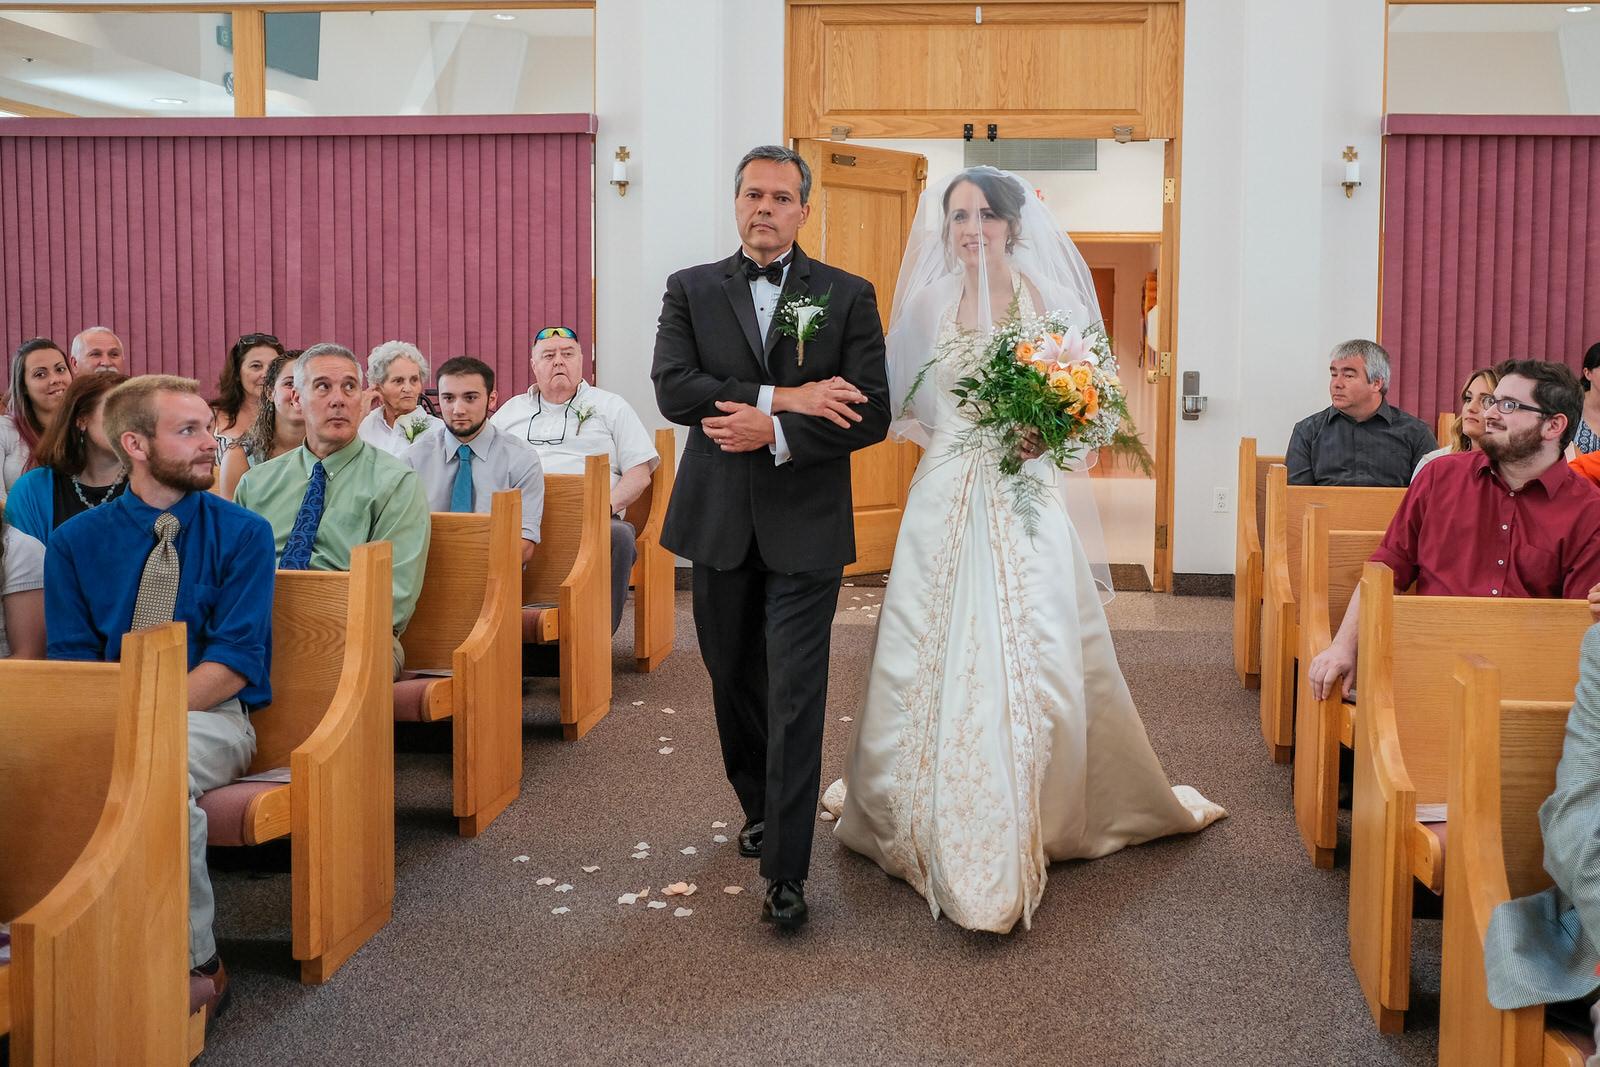 southern-nh-wedding-photography-254-1.jpg